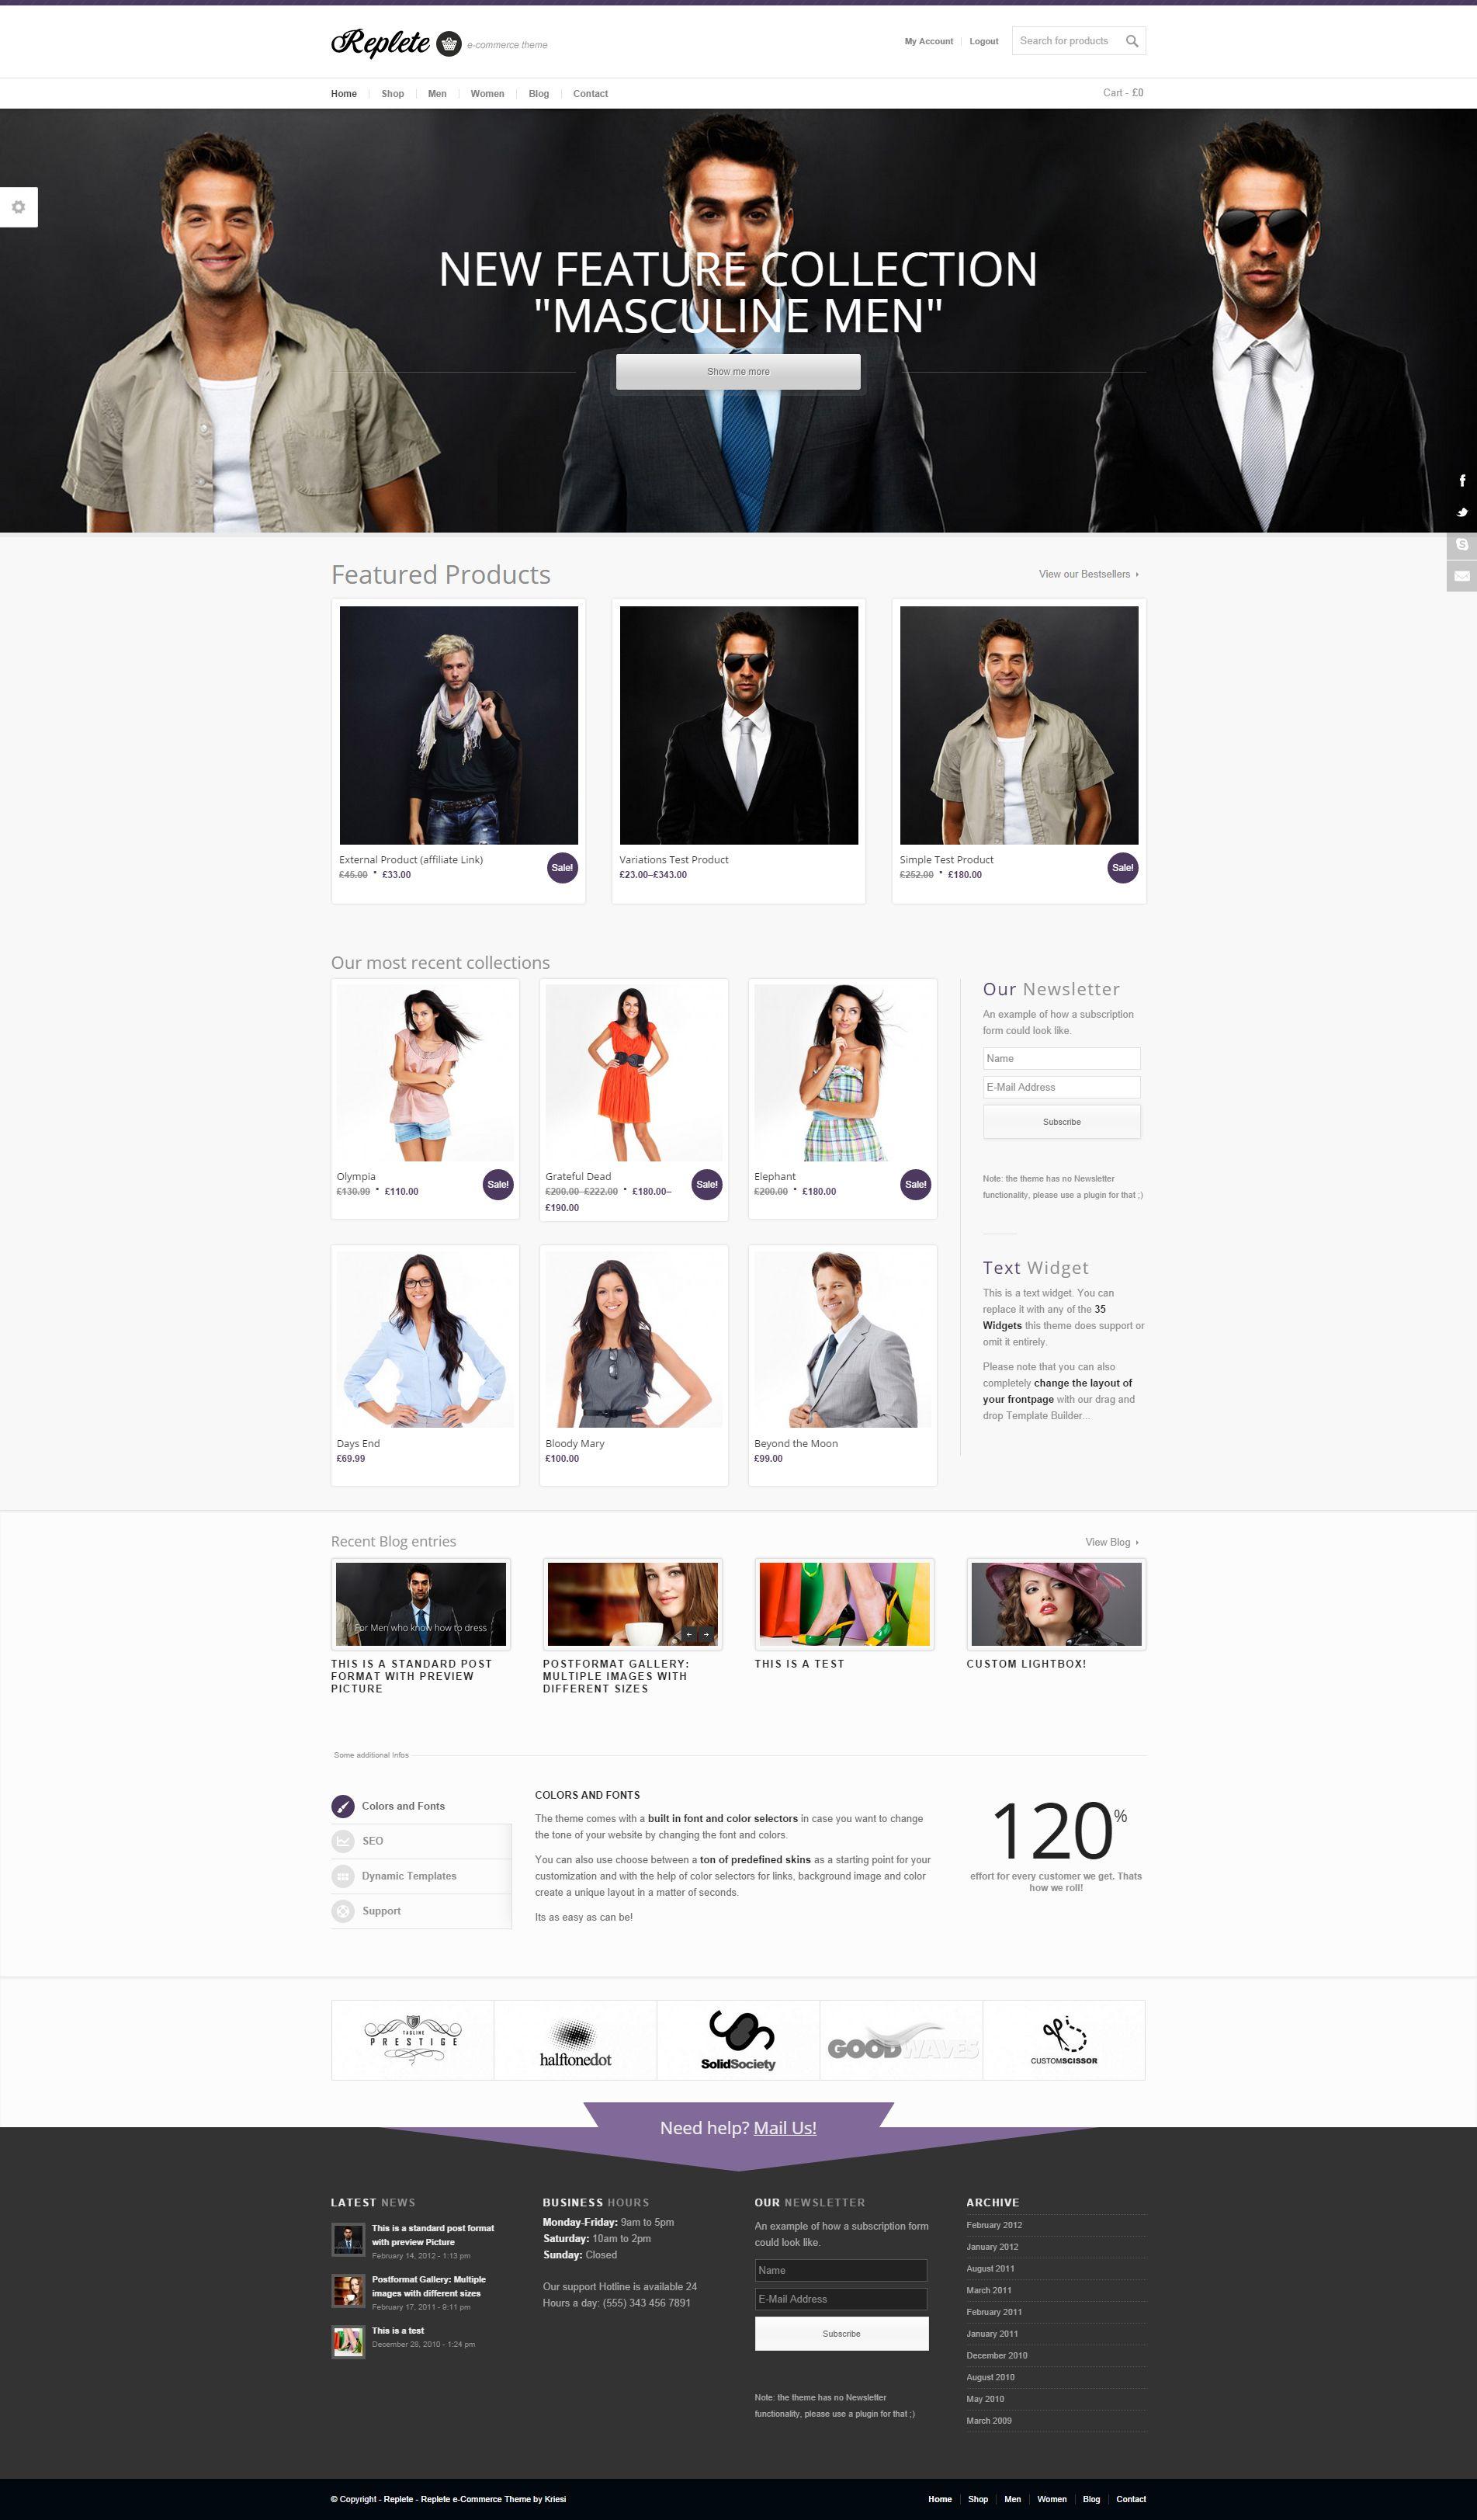 Template Responsive Parallax WordPress joomla Magento